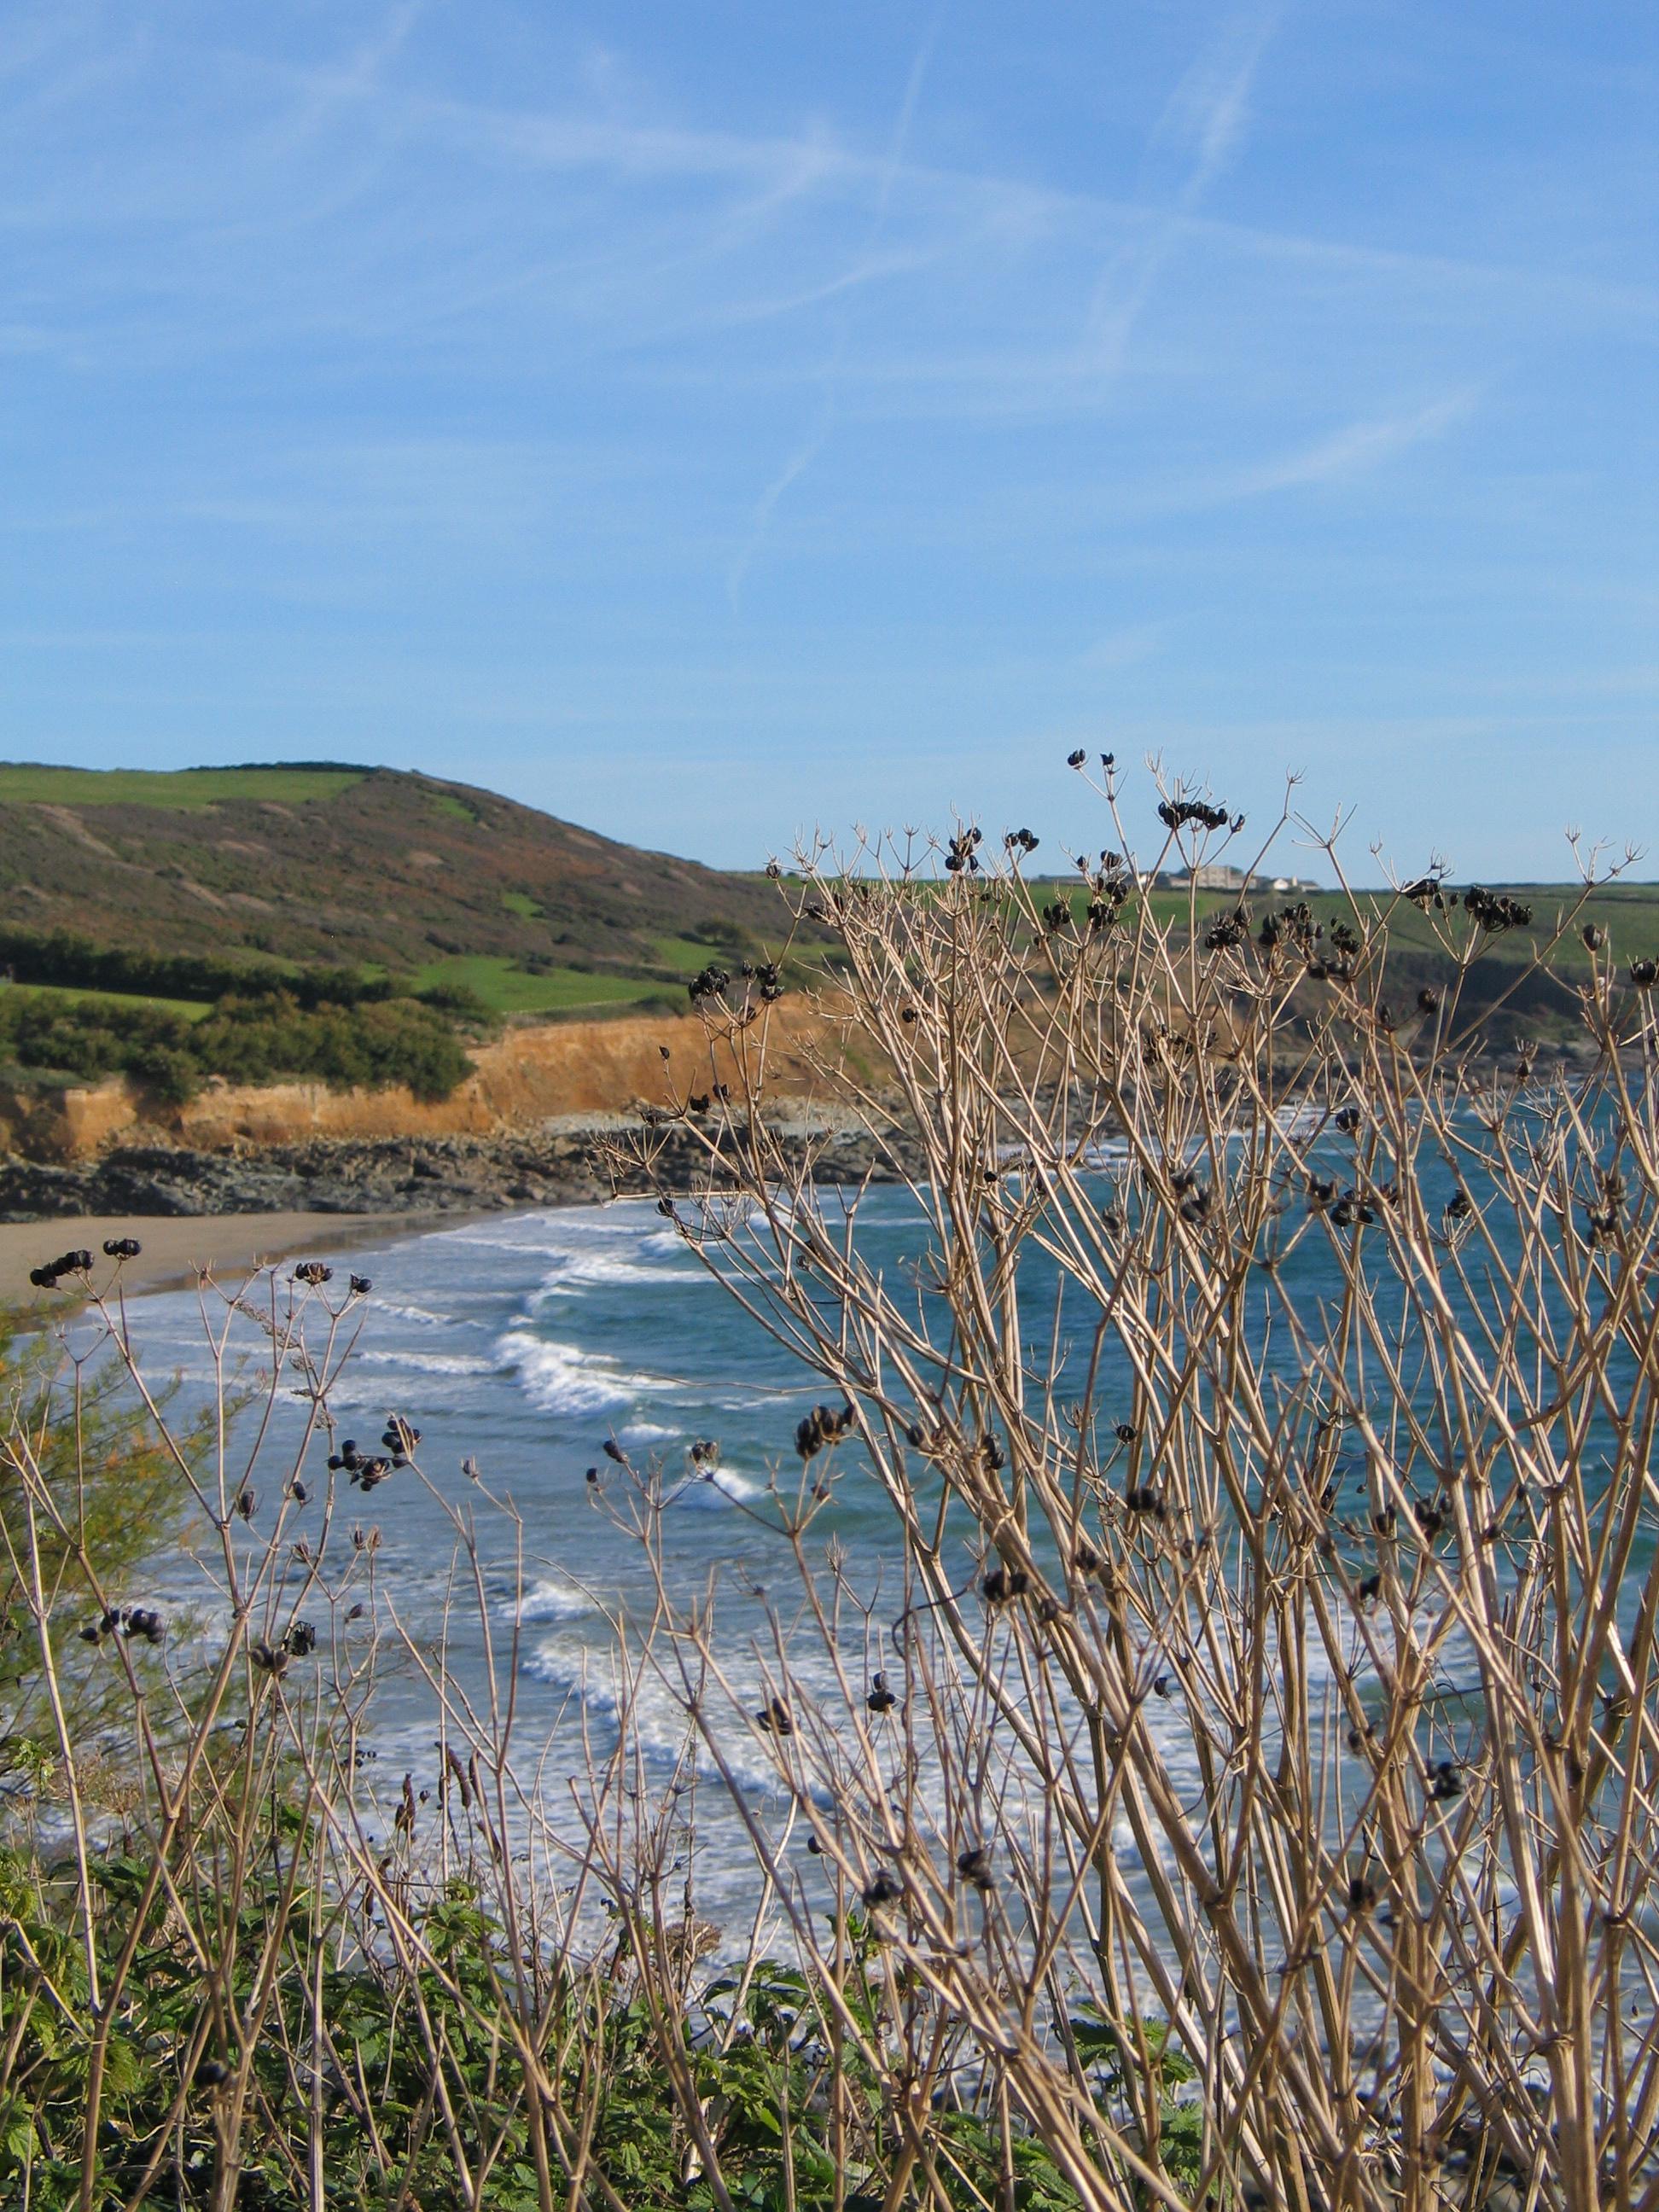 A glimpse of teh beach from the coastal footpath